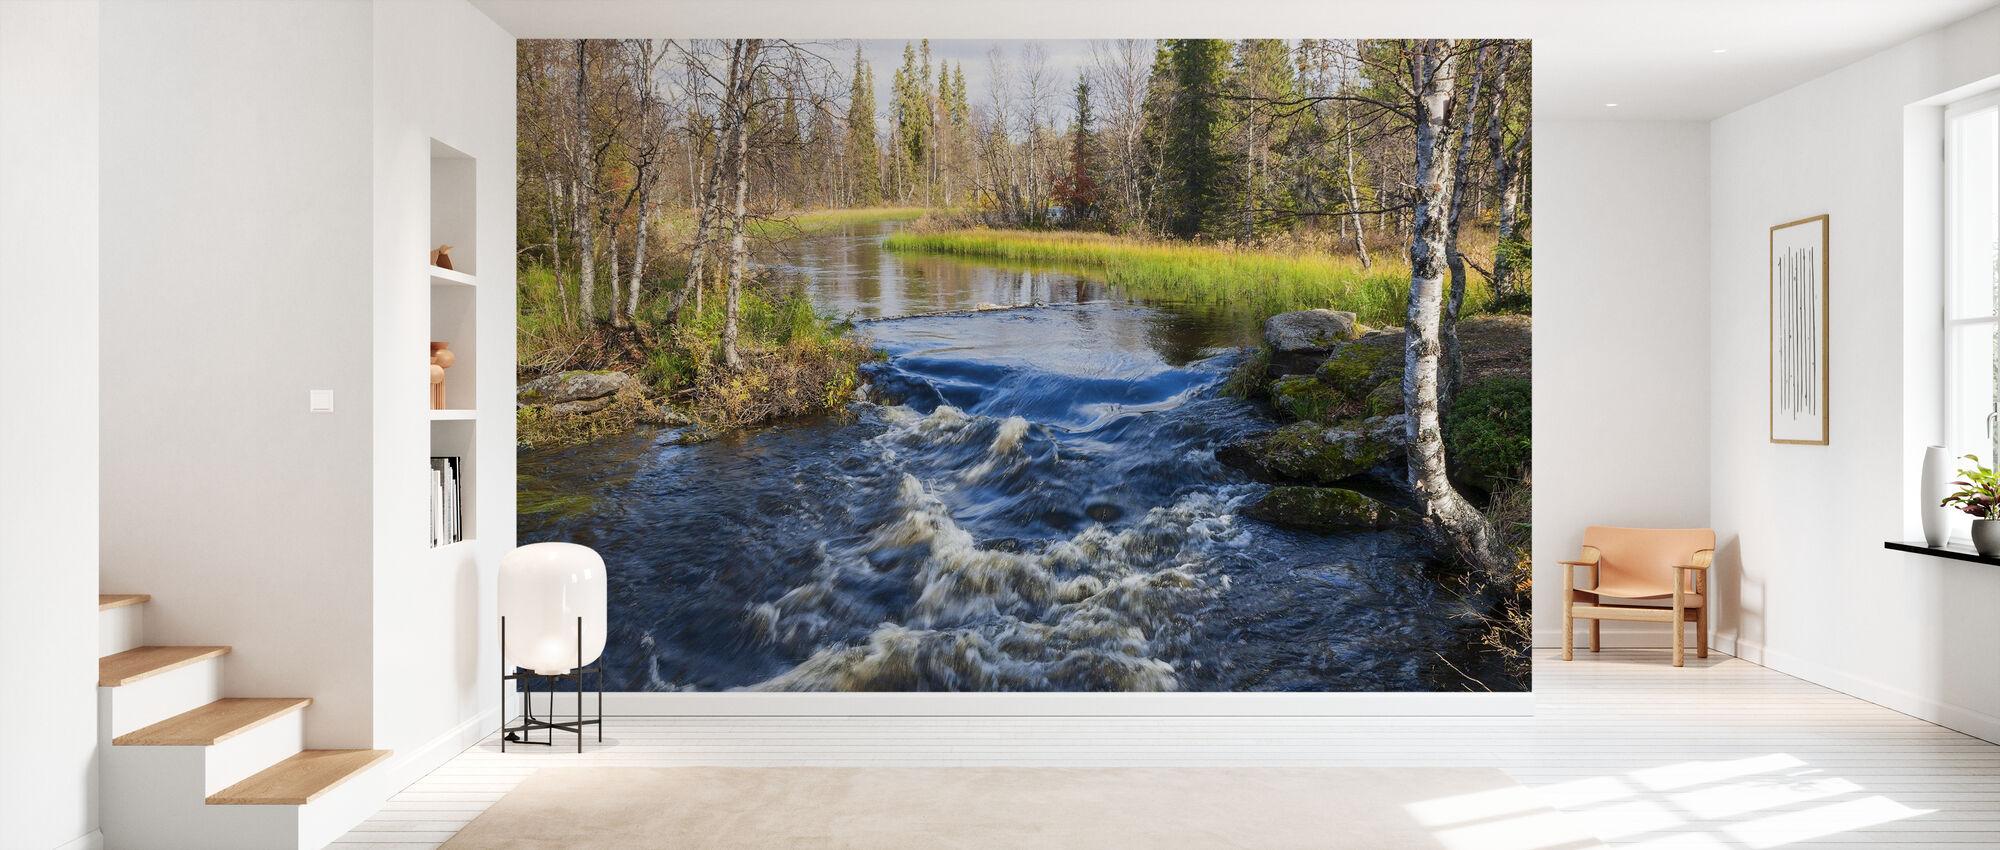 Lapland River - Wallpaper - Hallway